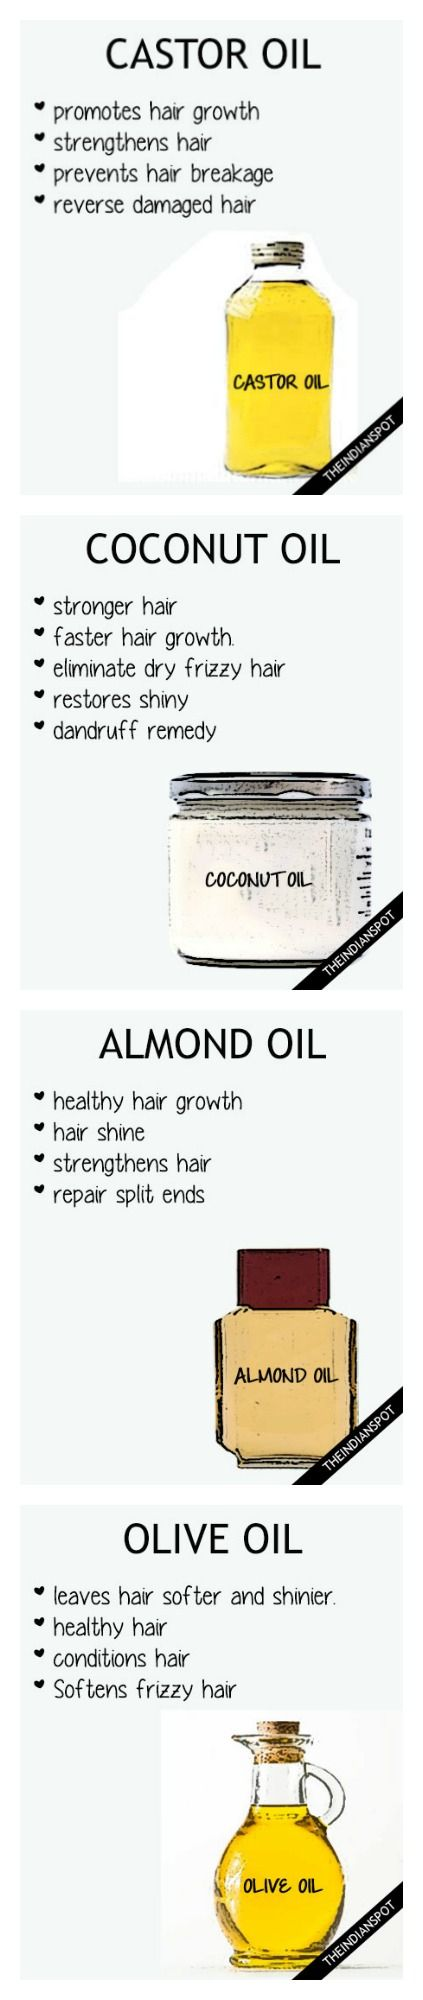 Jojoba Oil – Jojoba oil is capable of moisturizing the follicles of hair and hence can make hair str